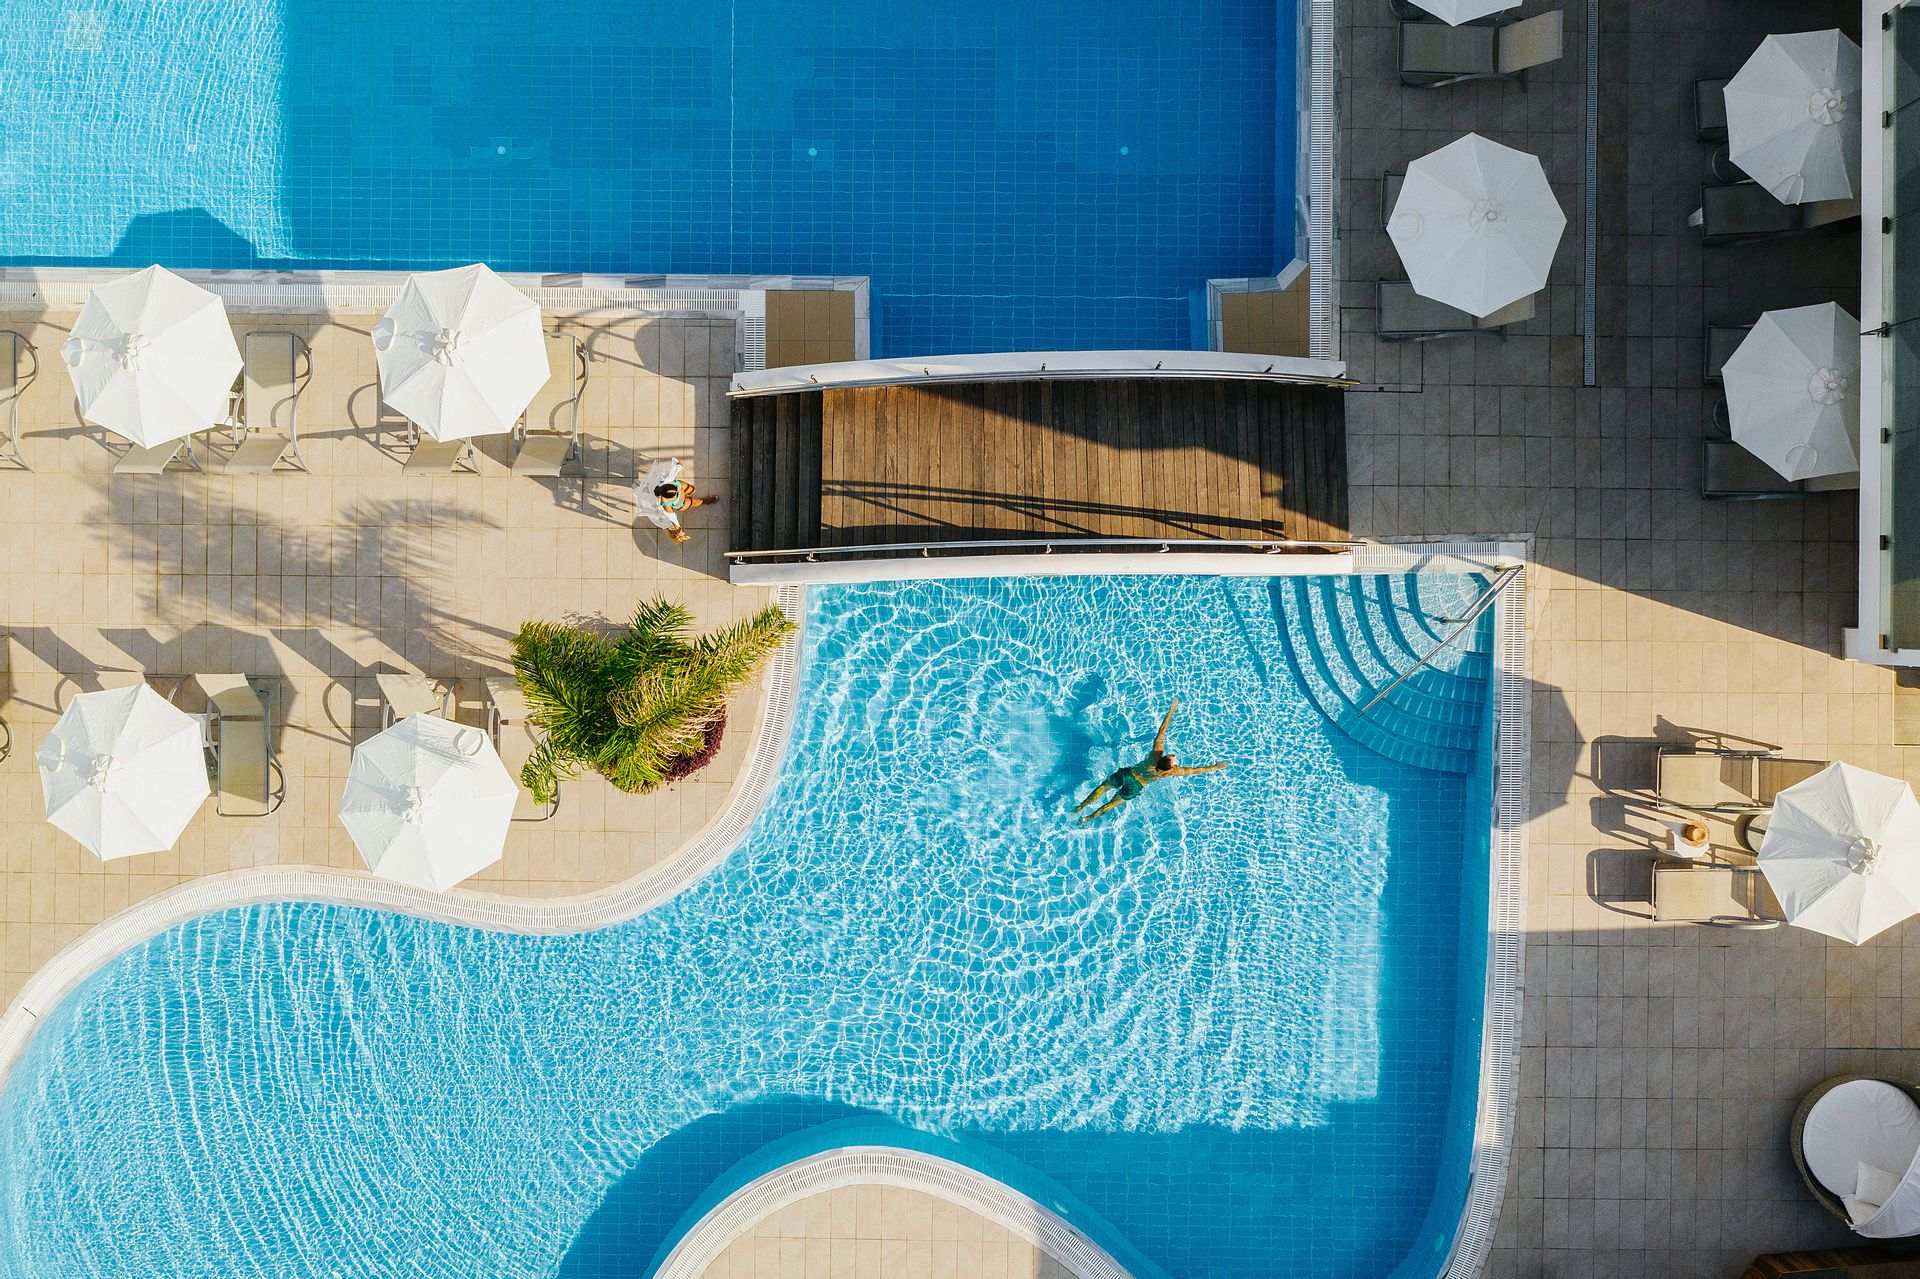 4* Sofianna Resort & Spa - Πάφος, Κύπρος ✦ 2 Ημέρες (1 Διανυκτέρευση) ✦ 2 άτομα + 1 παιδί έως 11 ετών ✦ Πρωινό ✦ 01/09/2021 έως 30/09/2021 ✦ Water Park για παιδιά!